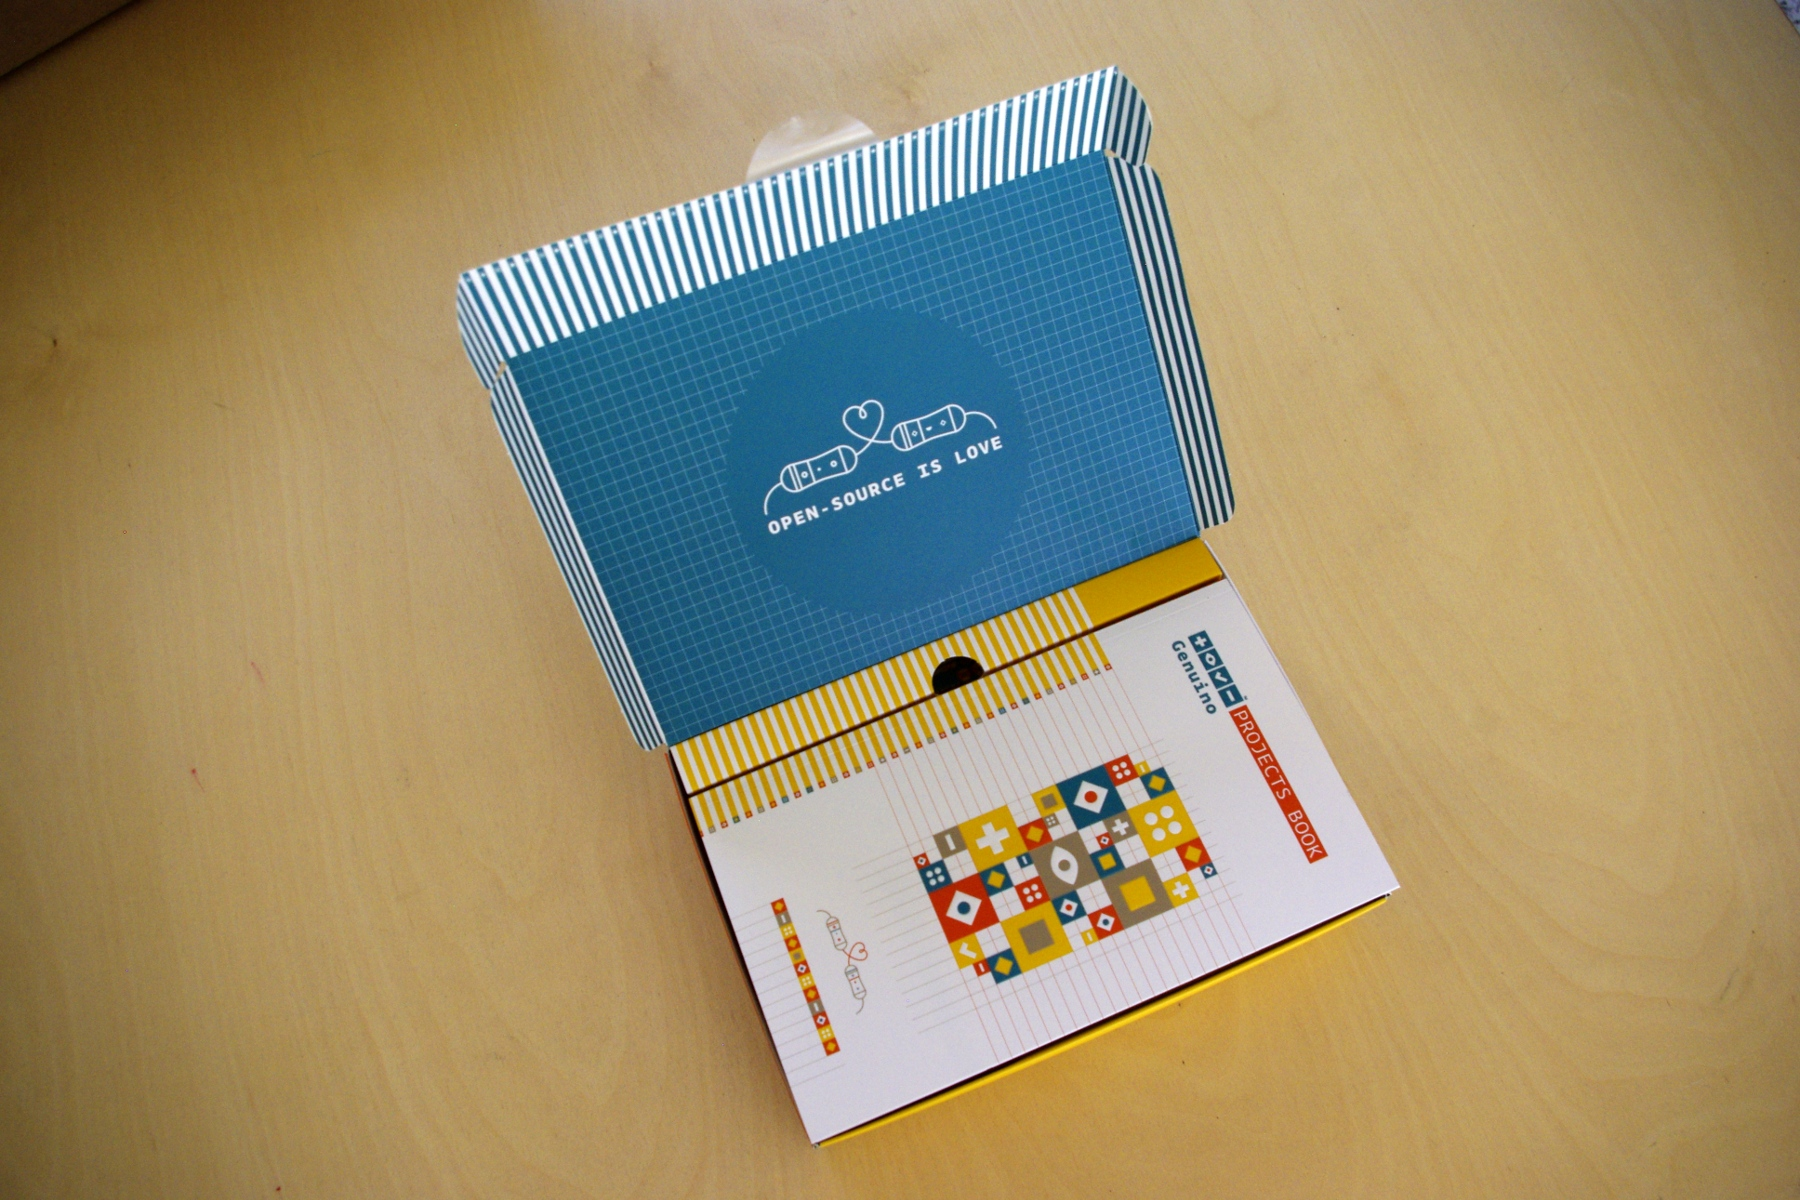 Genuino Starter Kit Box open